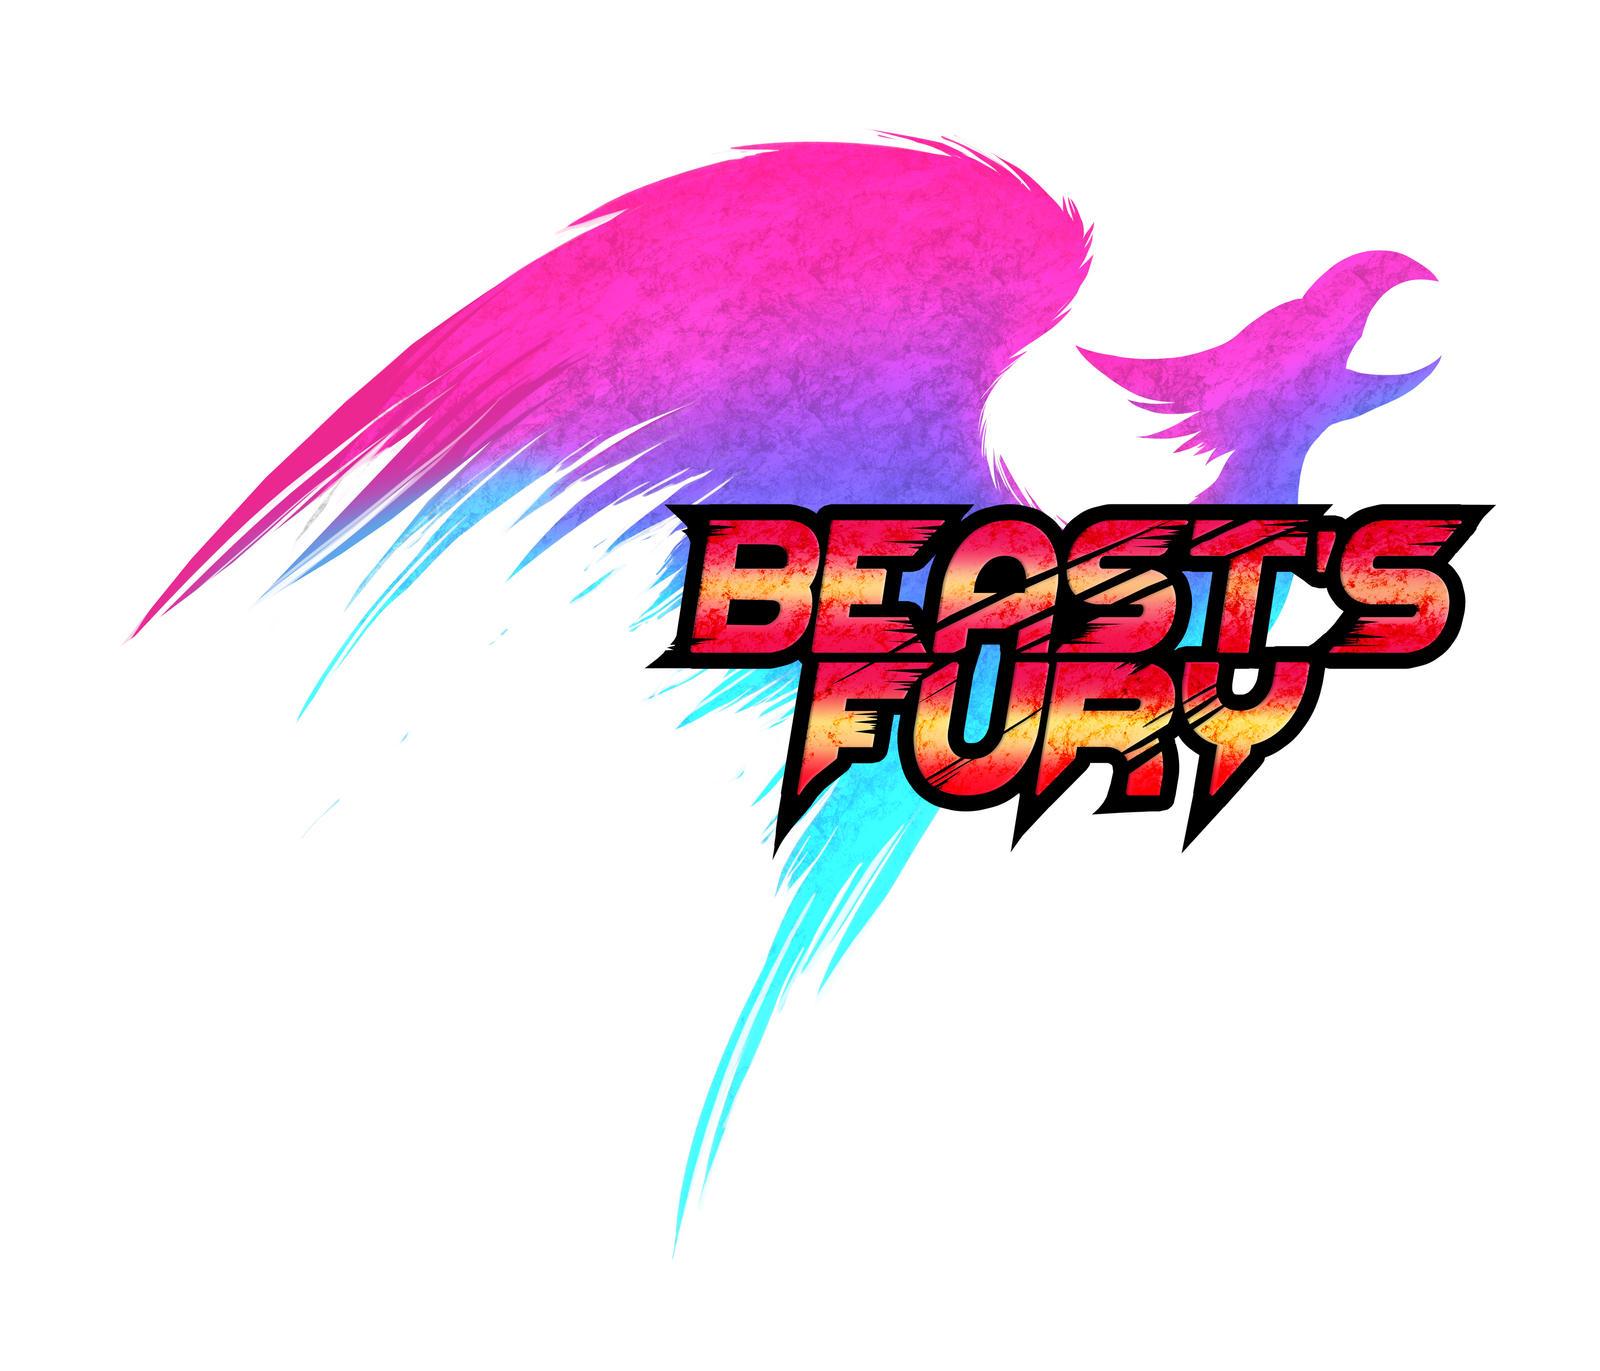 Design t shirts logo -  Beasts Fury Logo And T Shirt Design By Beastsfury